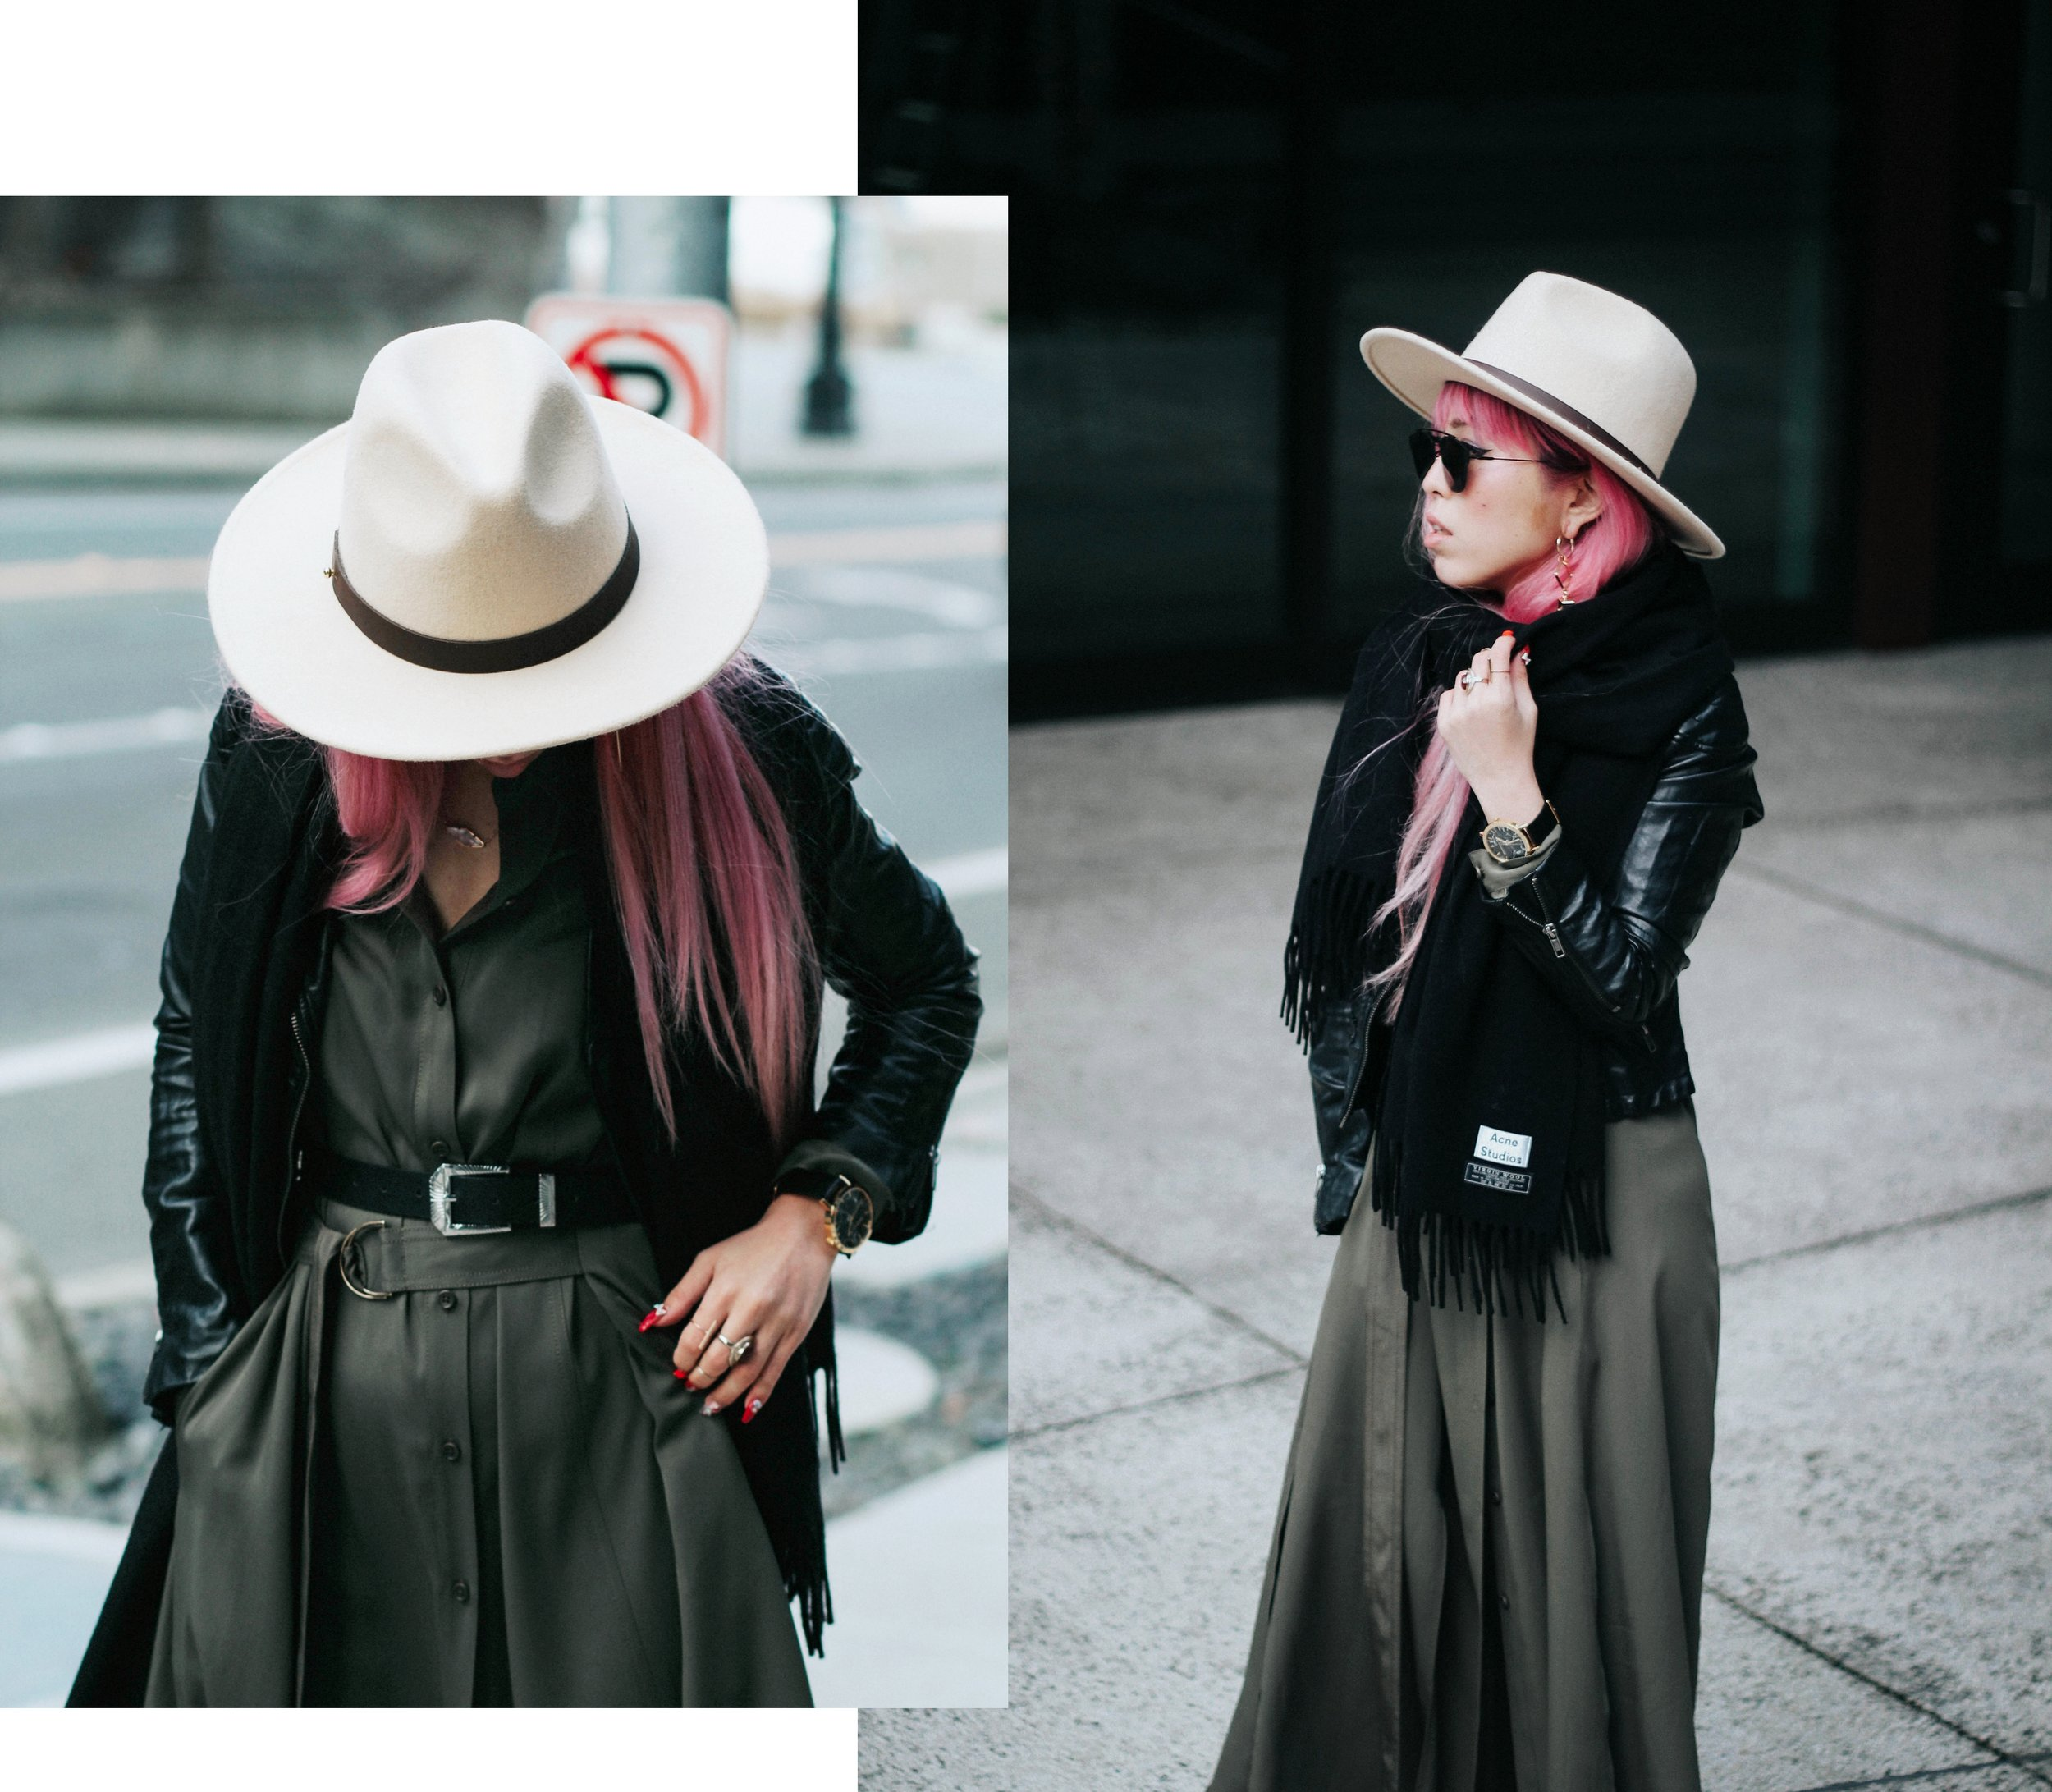 Acne Studios Black Canada Narrow Scarf-Lack Of Color Fedora-H&M biker Jacket-DVF silk shirt dress-ASOS western belt-zara statement bag-ASOS western mule-Aikas love closet-pink hair-seattle fashion lifestyle blogger-japanese 13